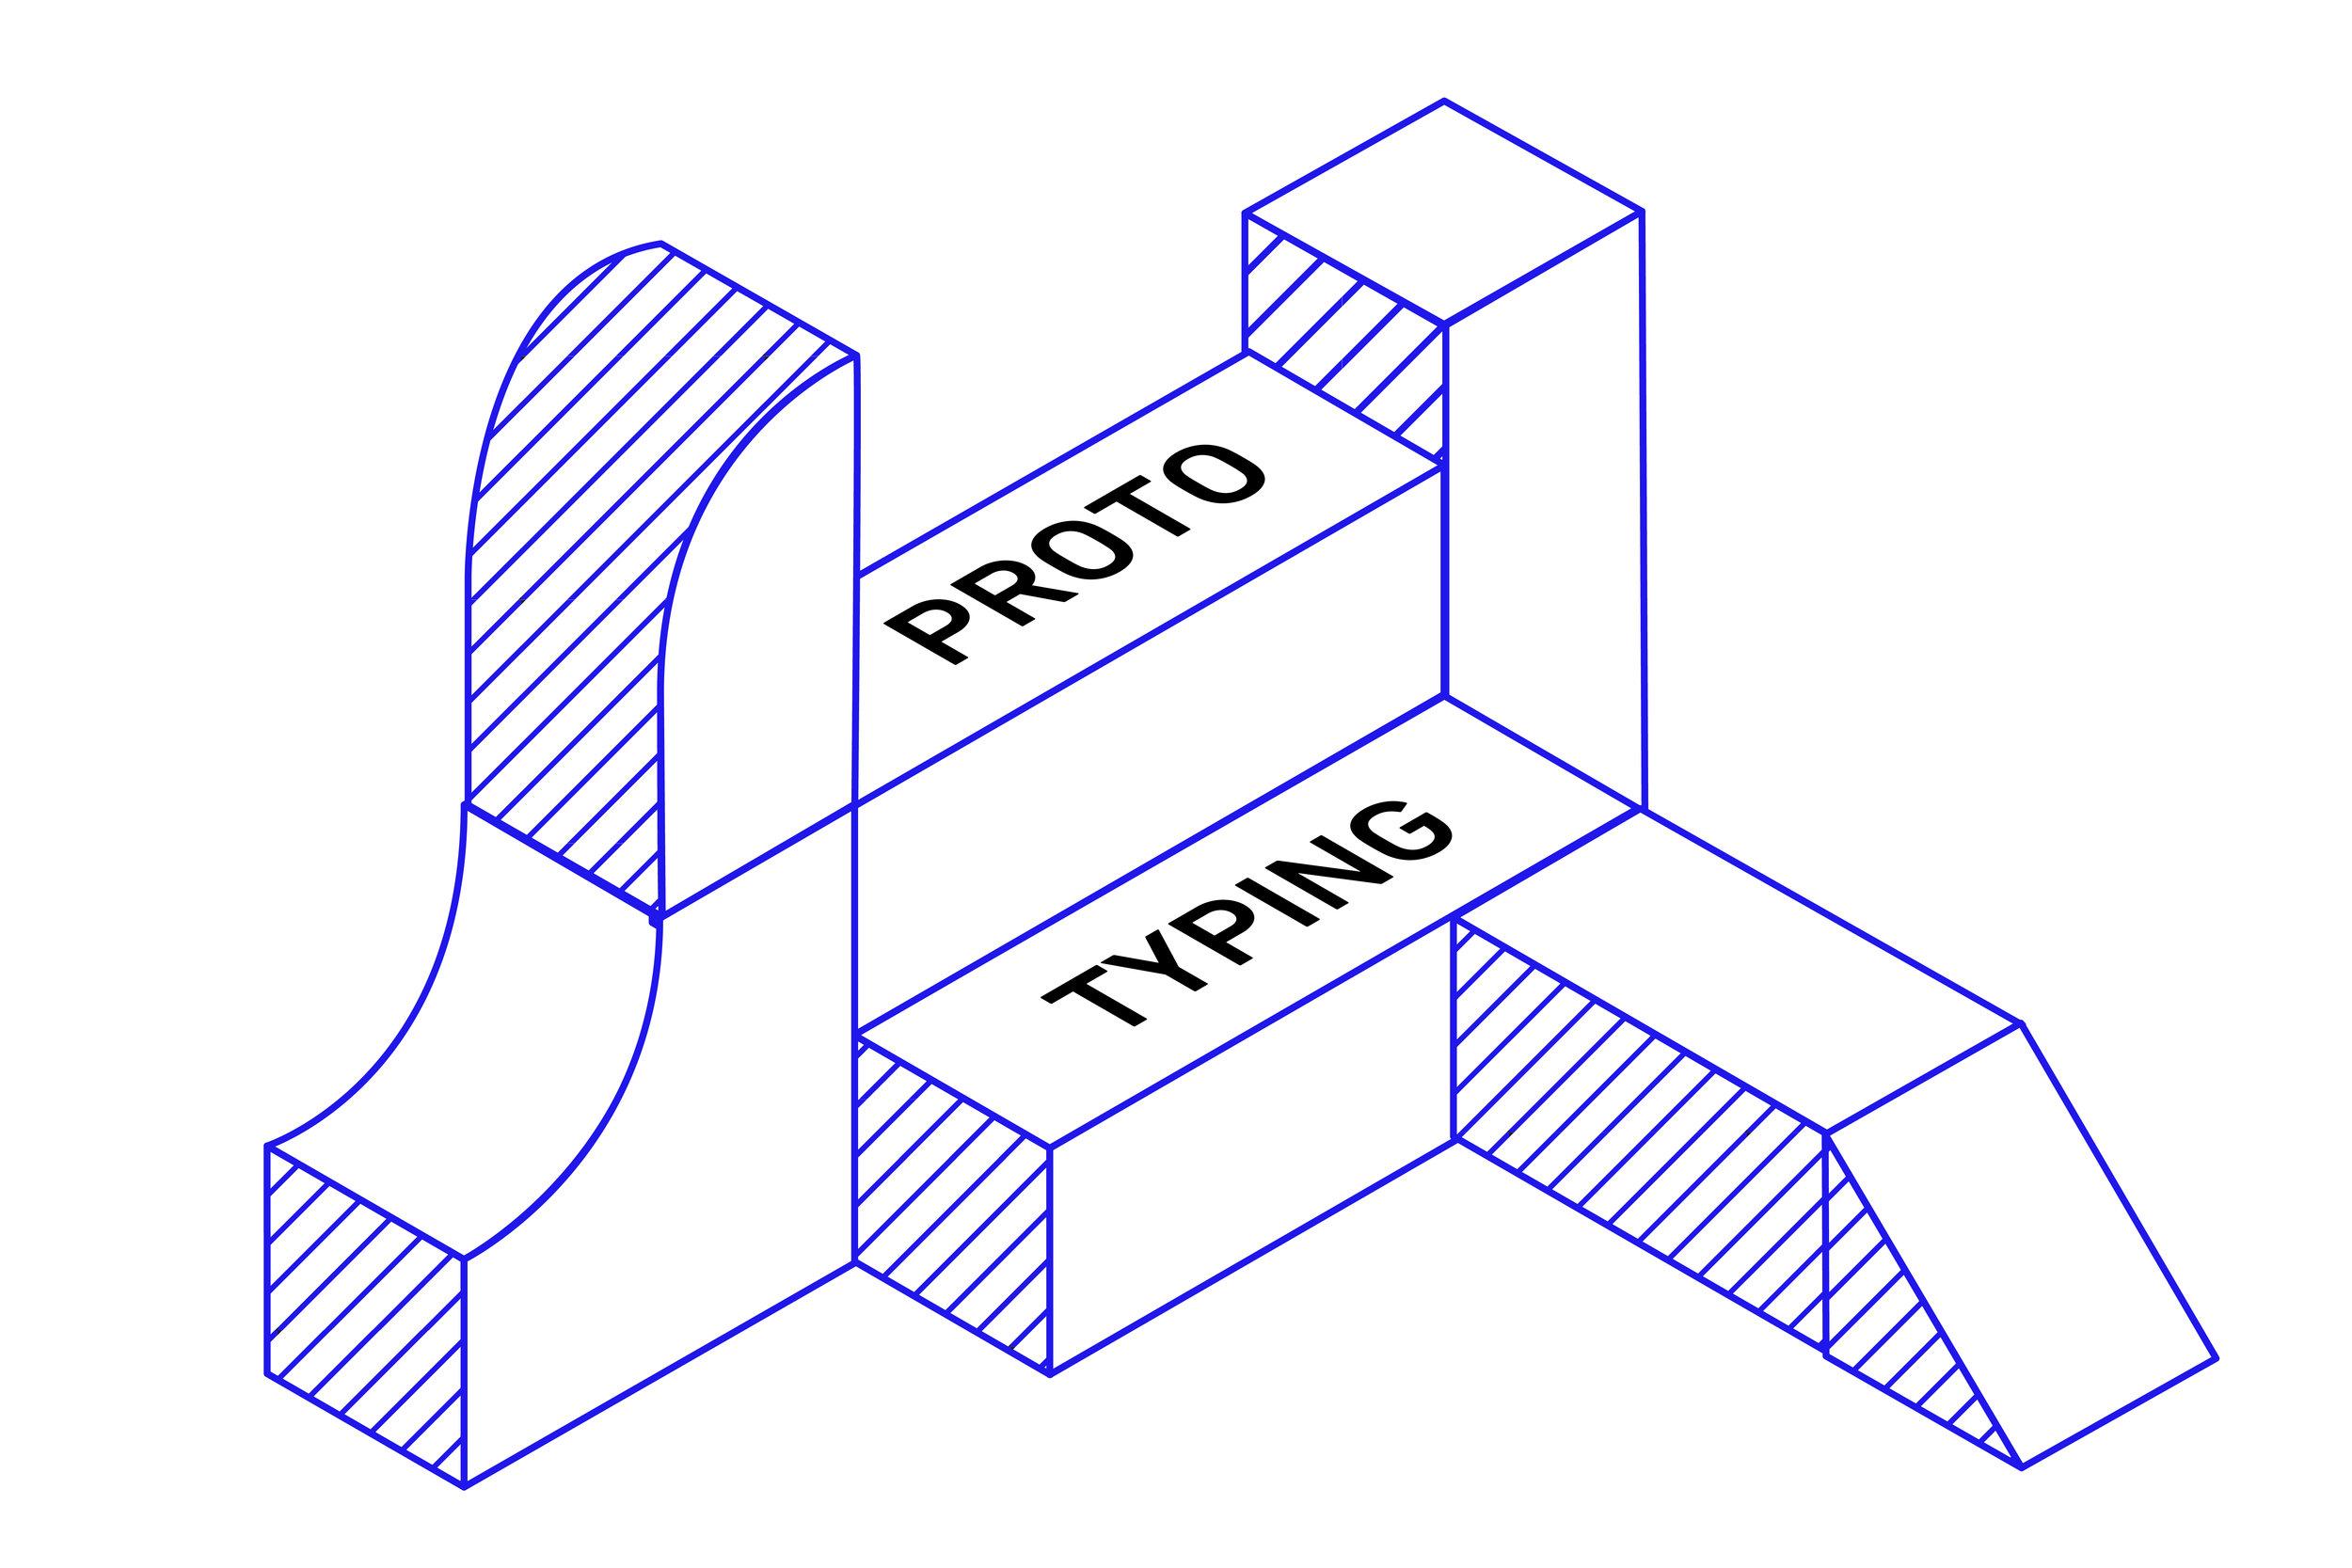 MDW_PROTOTYPING_MDW_PROTOTYPING.jpg